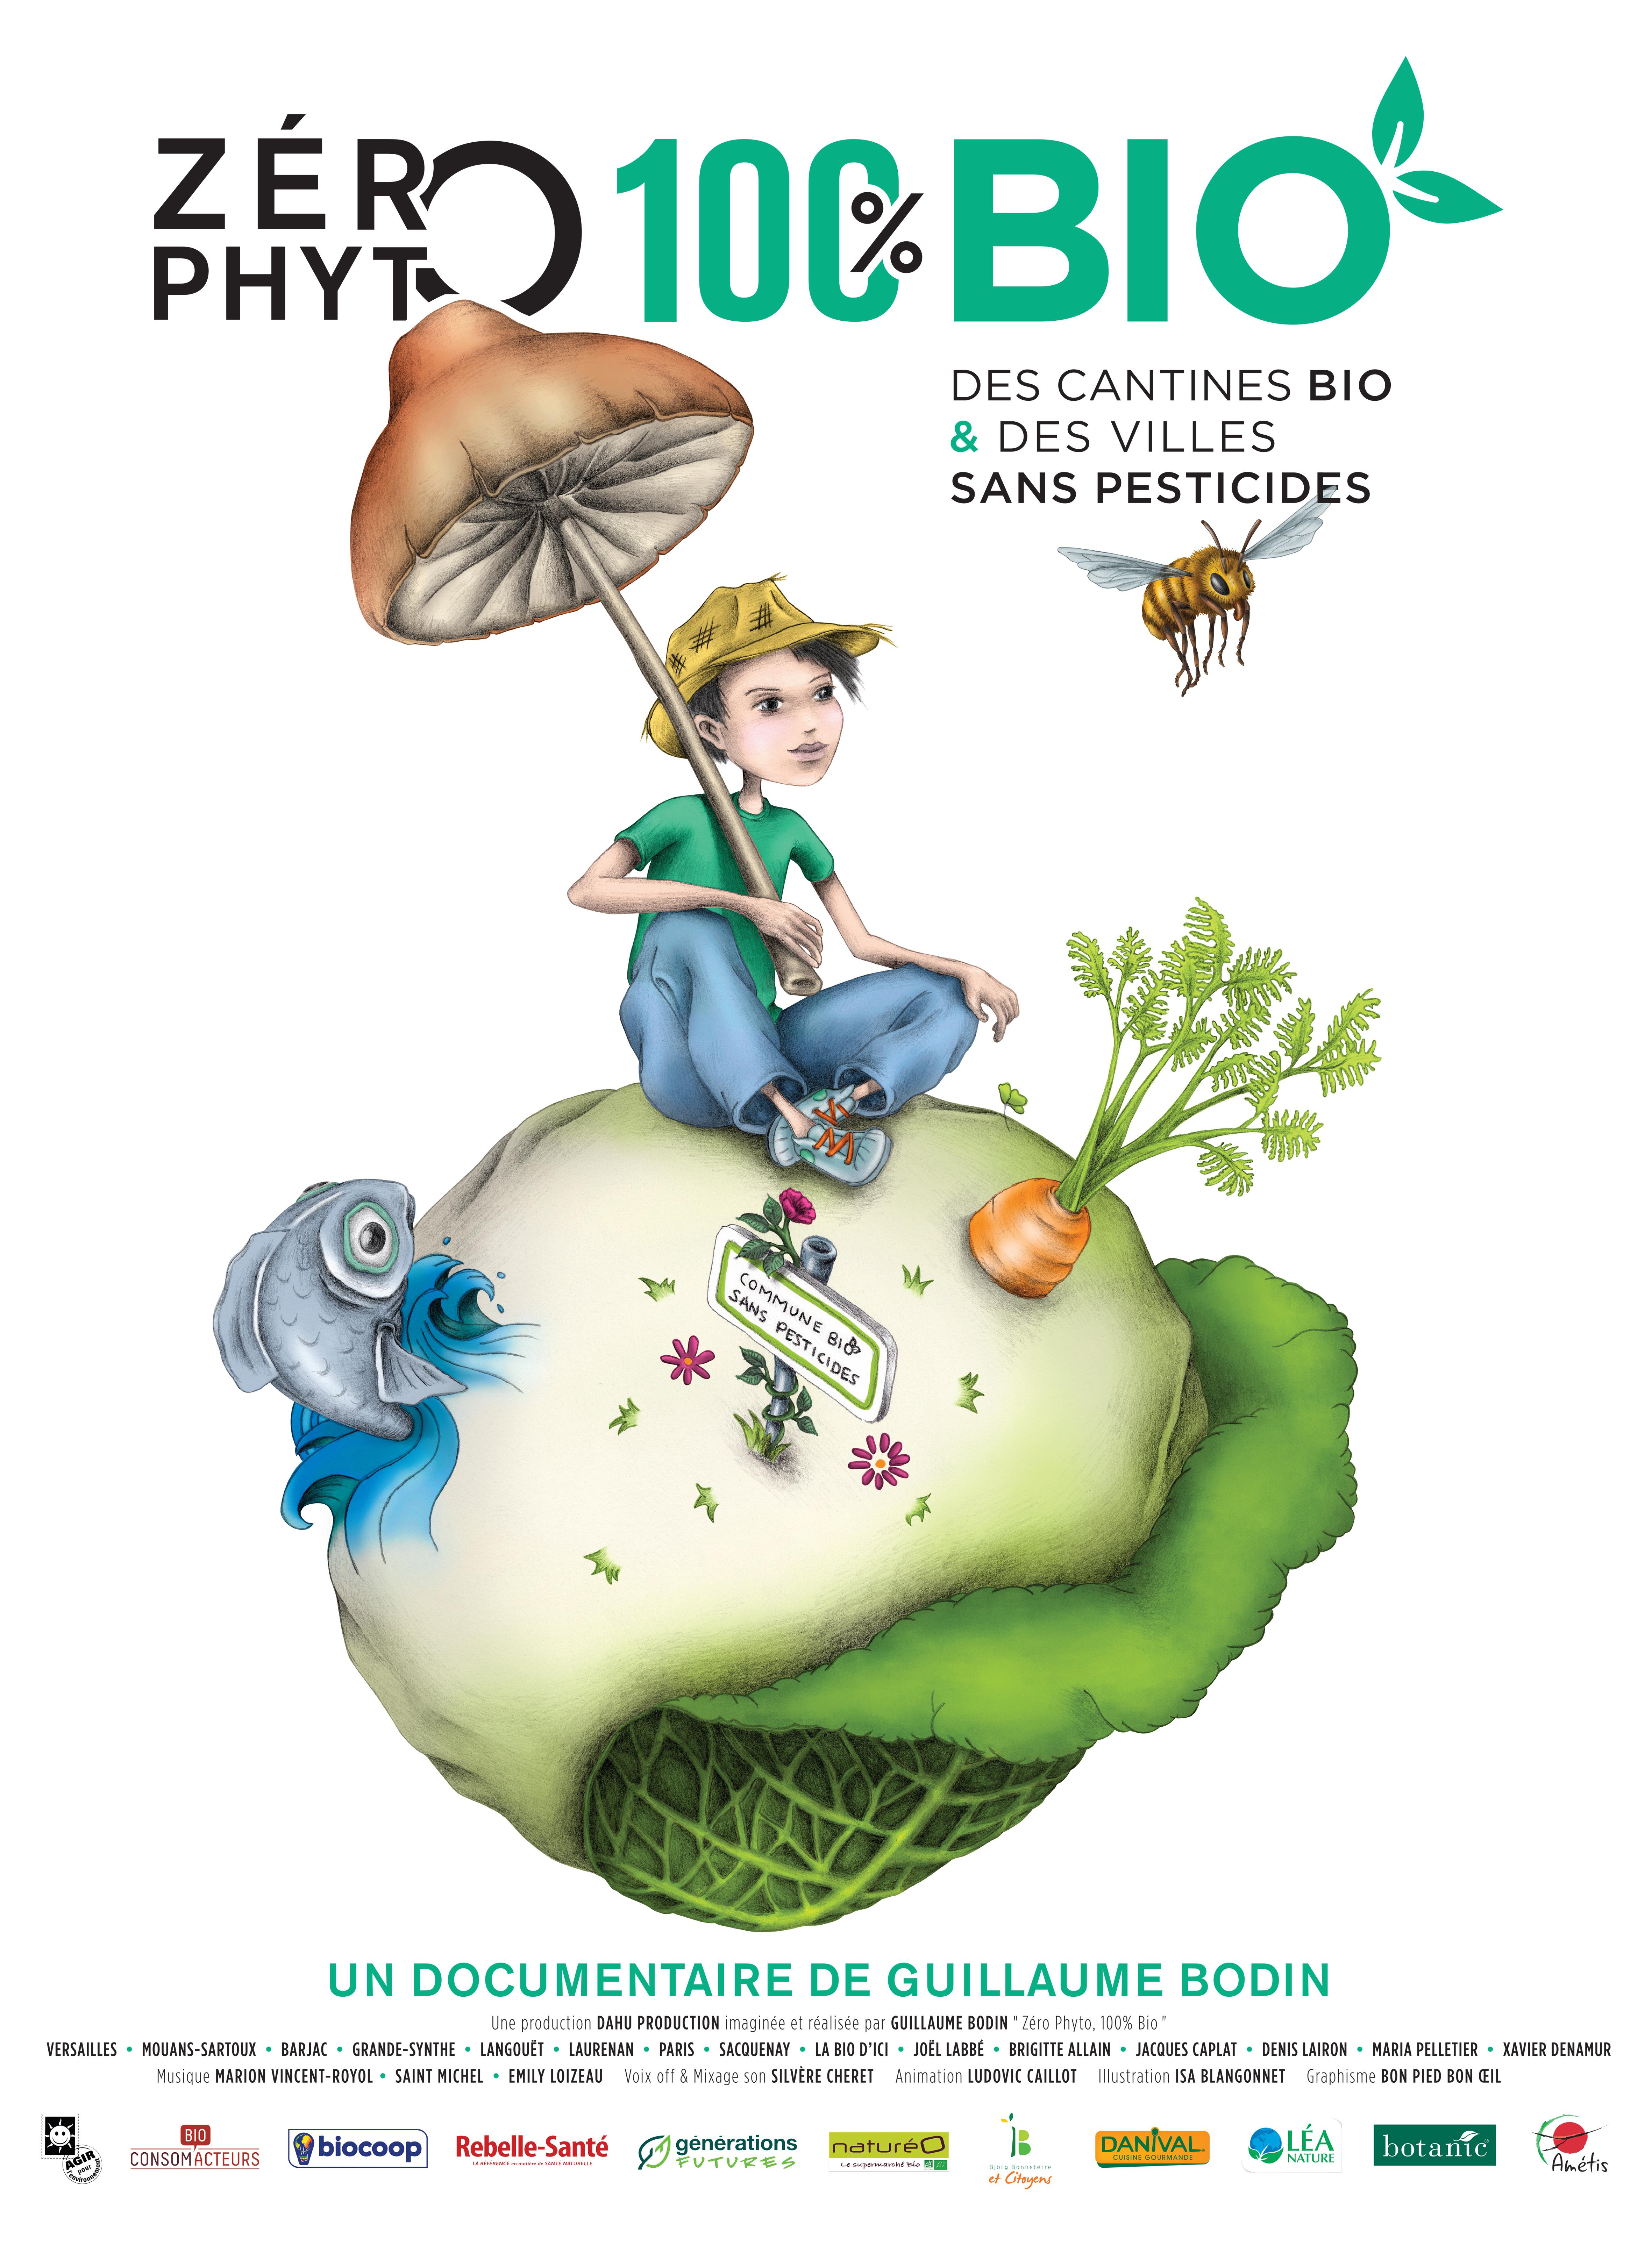 http://www.semaine-sans-pesticides.fr/wp-content/uploads/2017/02/affiche-zero-phyto-100-bio.jpg